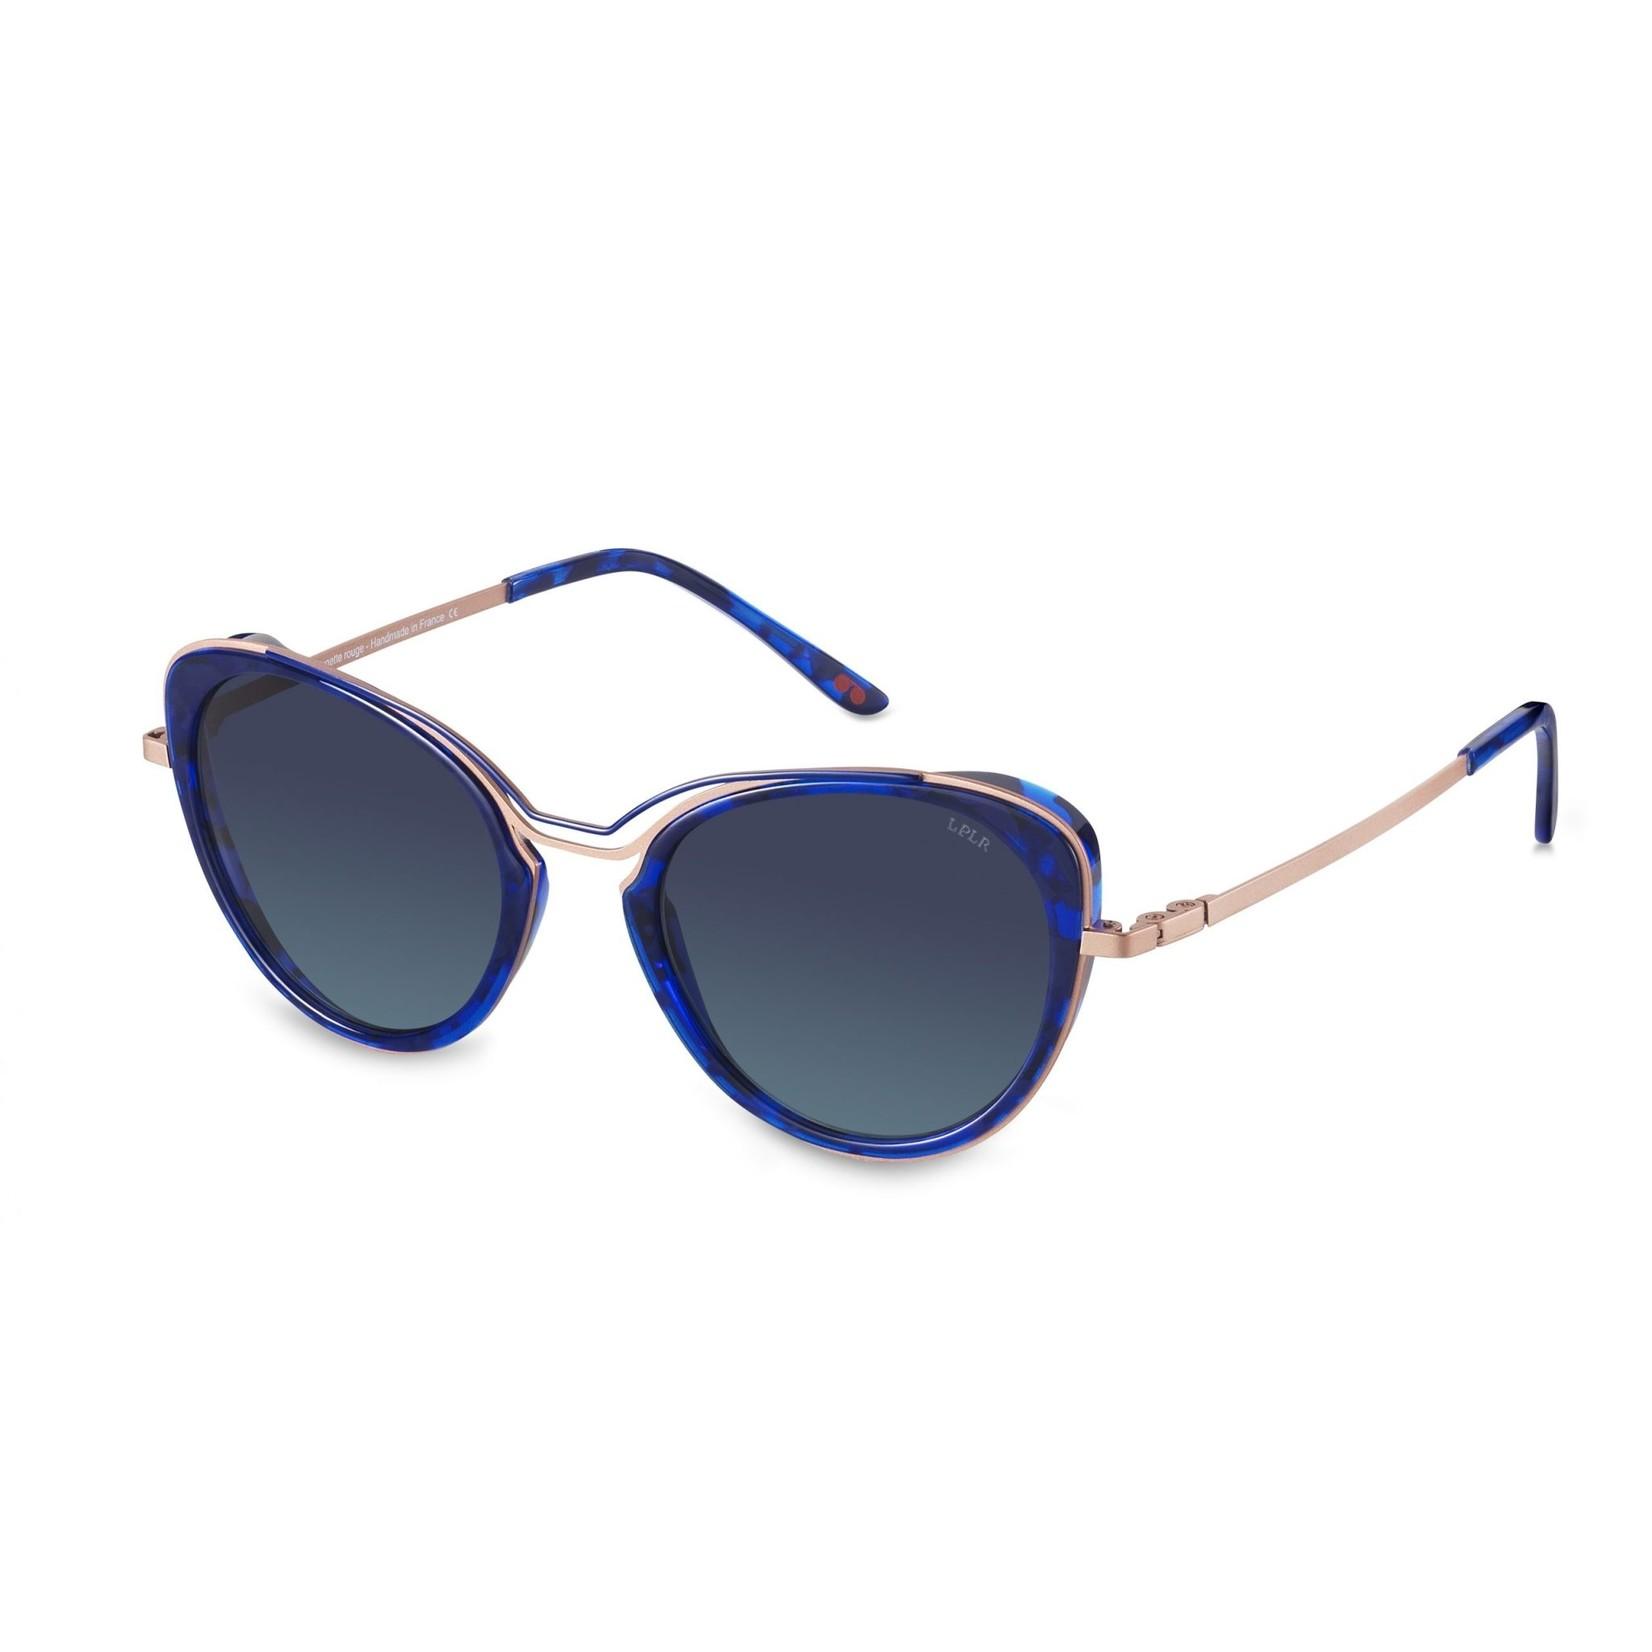 La Petite Lunette Eyewear LPLR Cheridens Sun